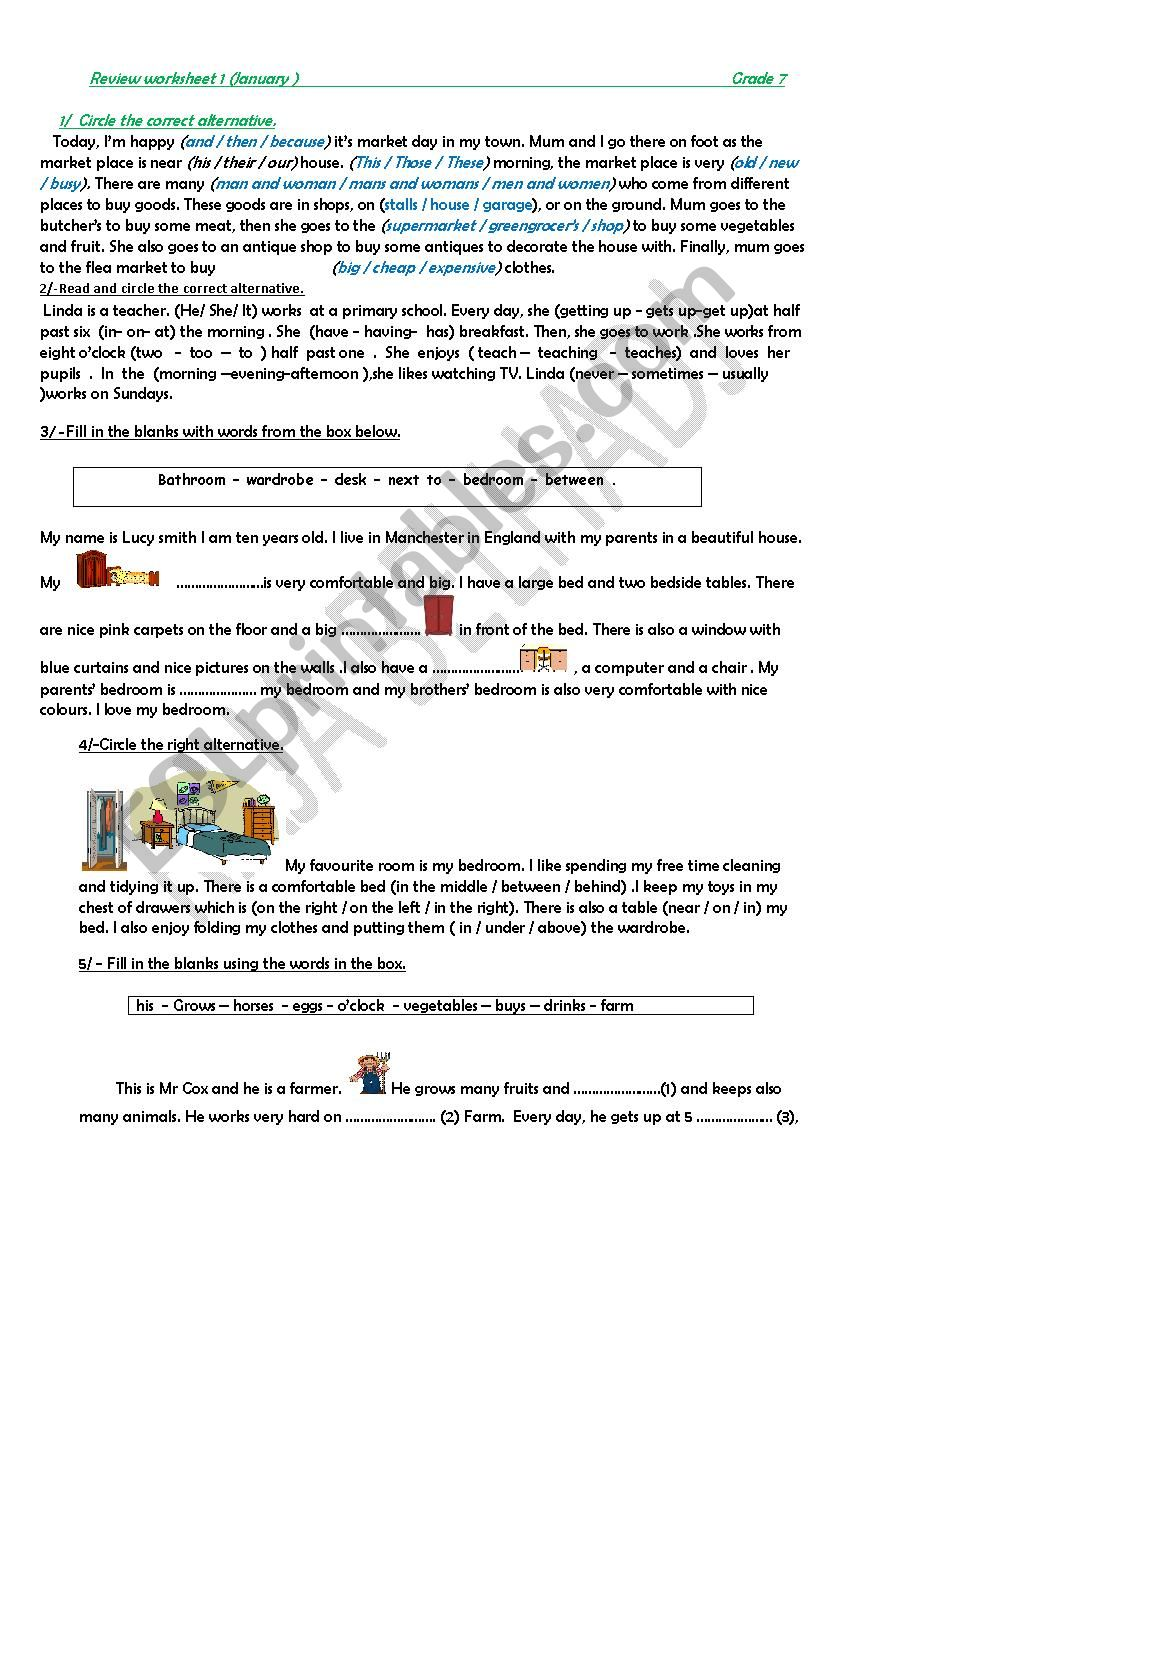 Revision Worksheet Module 3 Grade 7 Tunisian Programme